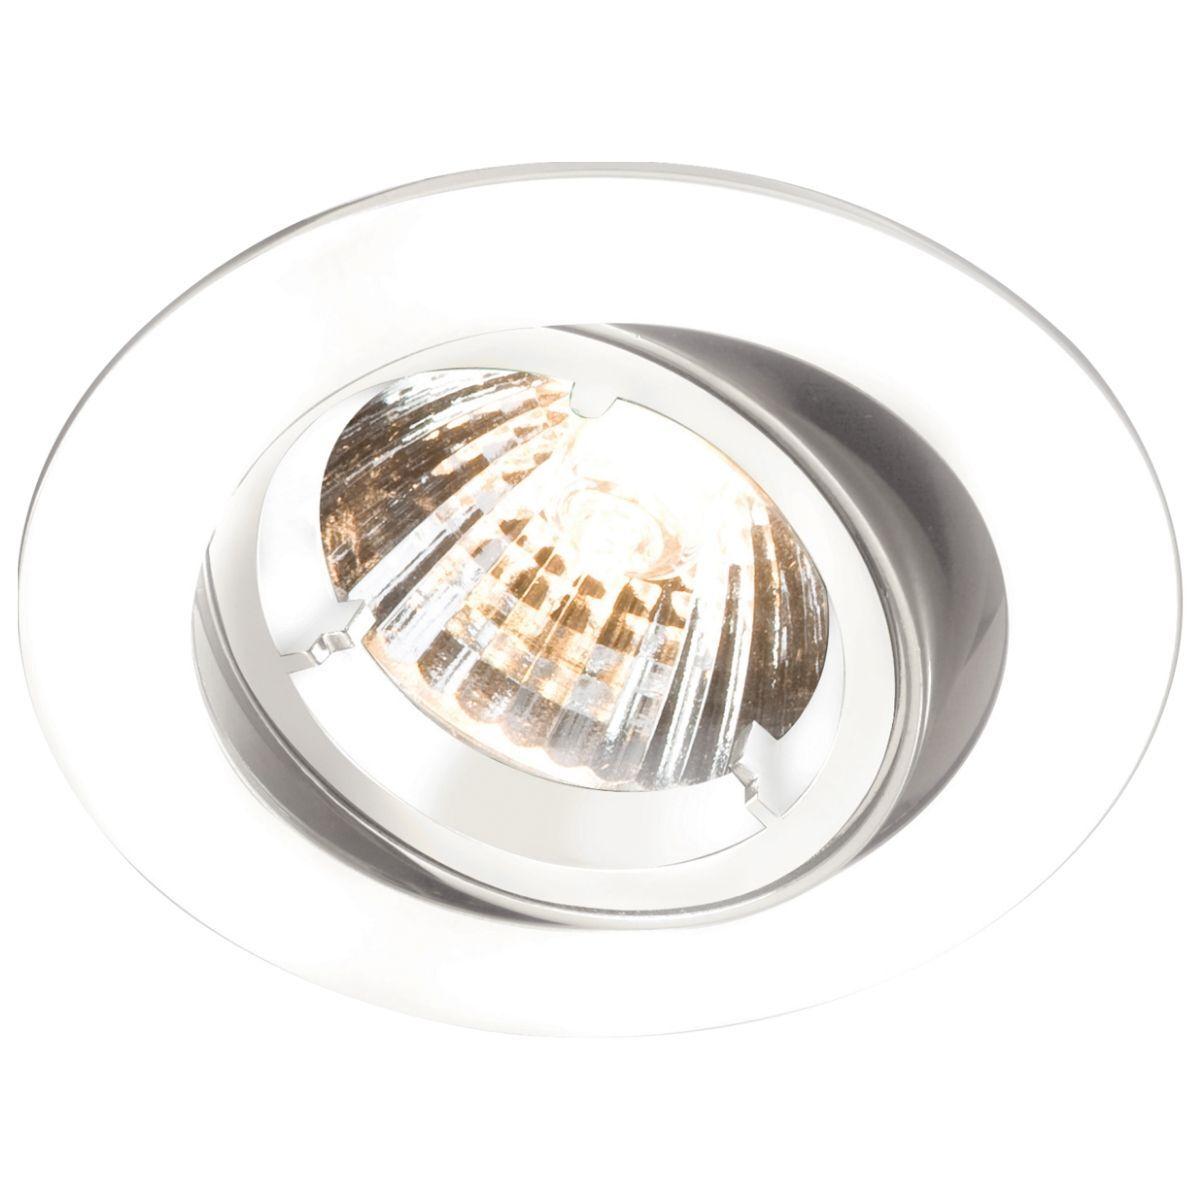 Simple Lighting White GU10 Tilt Downlight. Die-Cast Twist & Lock